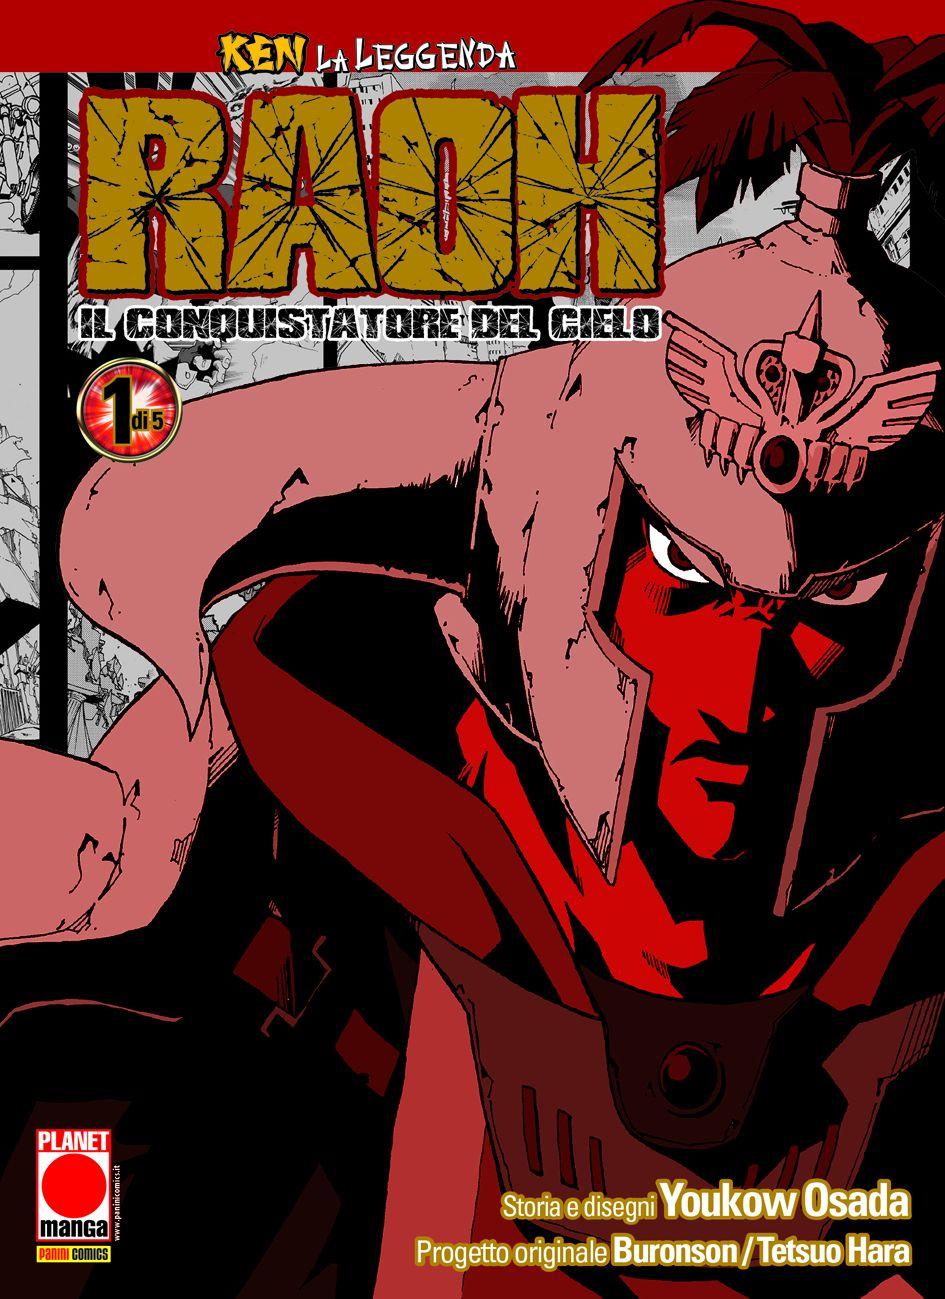 ken la leggenda raoh conquistatore del cielo, manga, panini